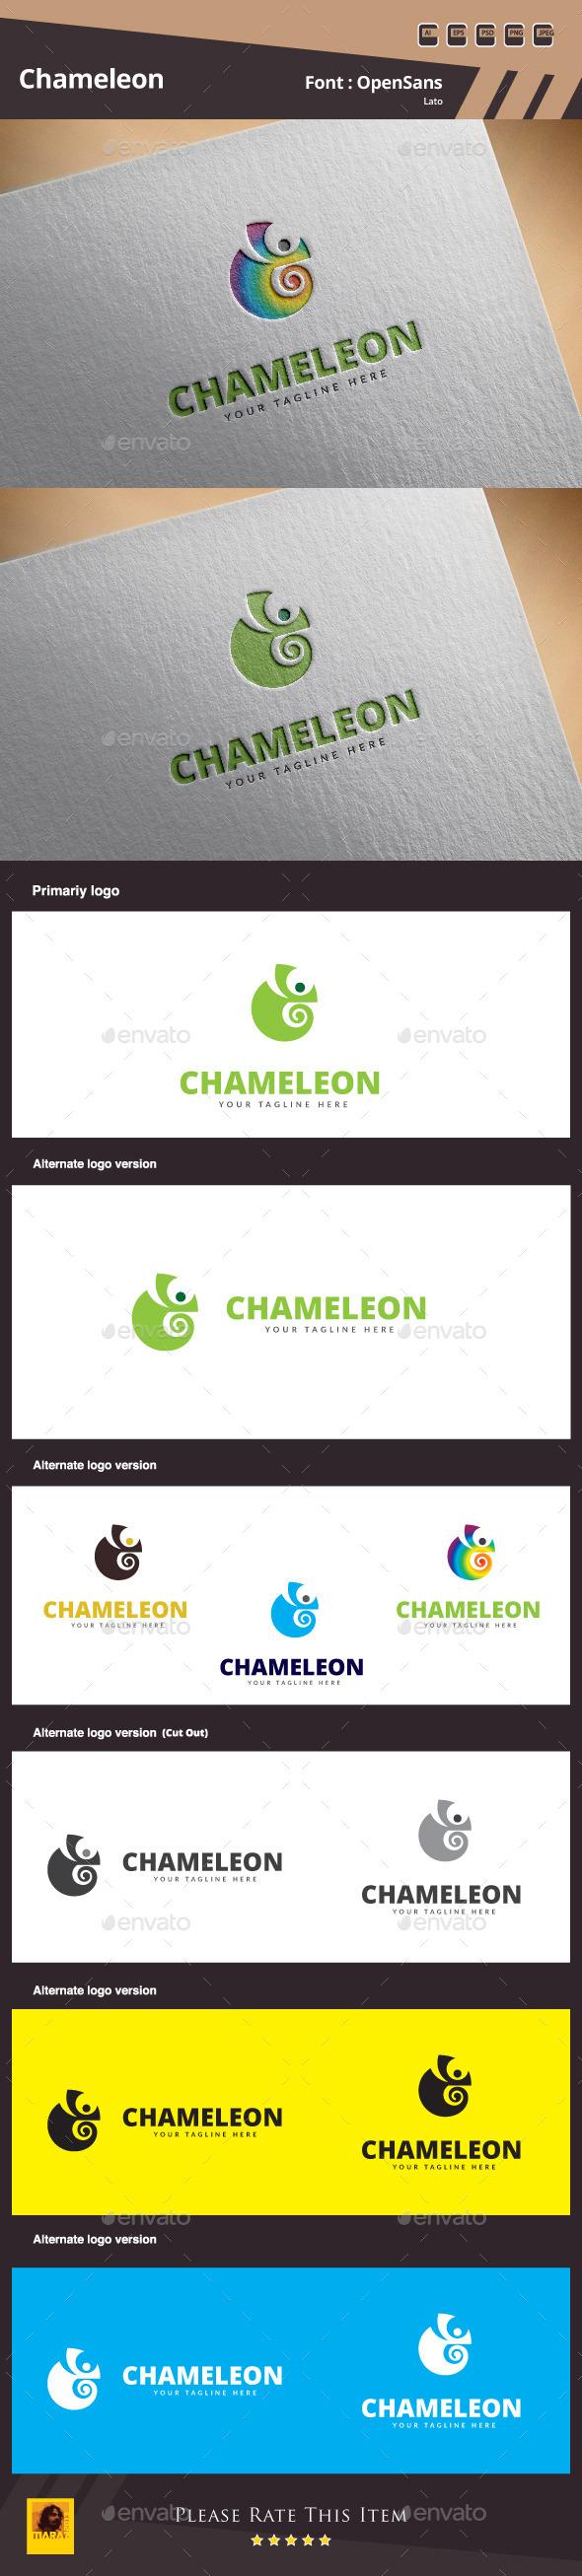 GraphicRiver Chameleon Logo Template 10622717